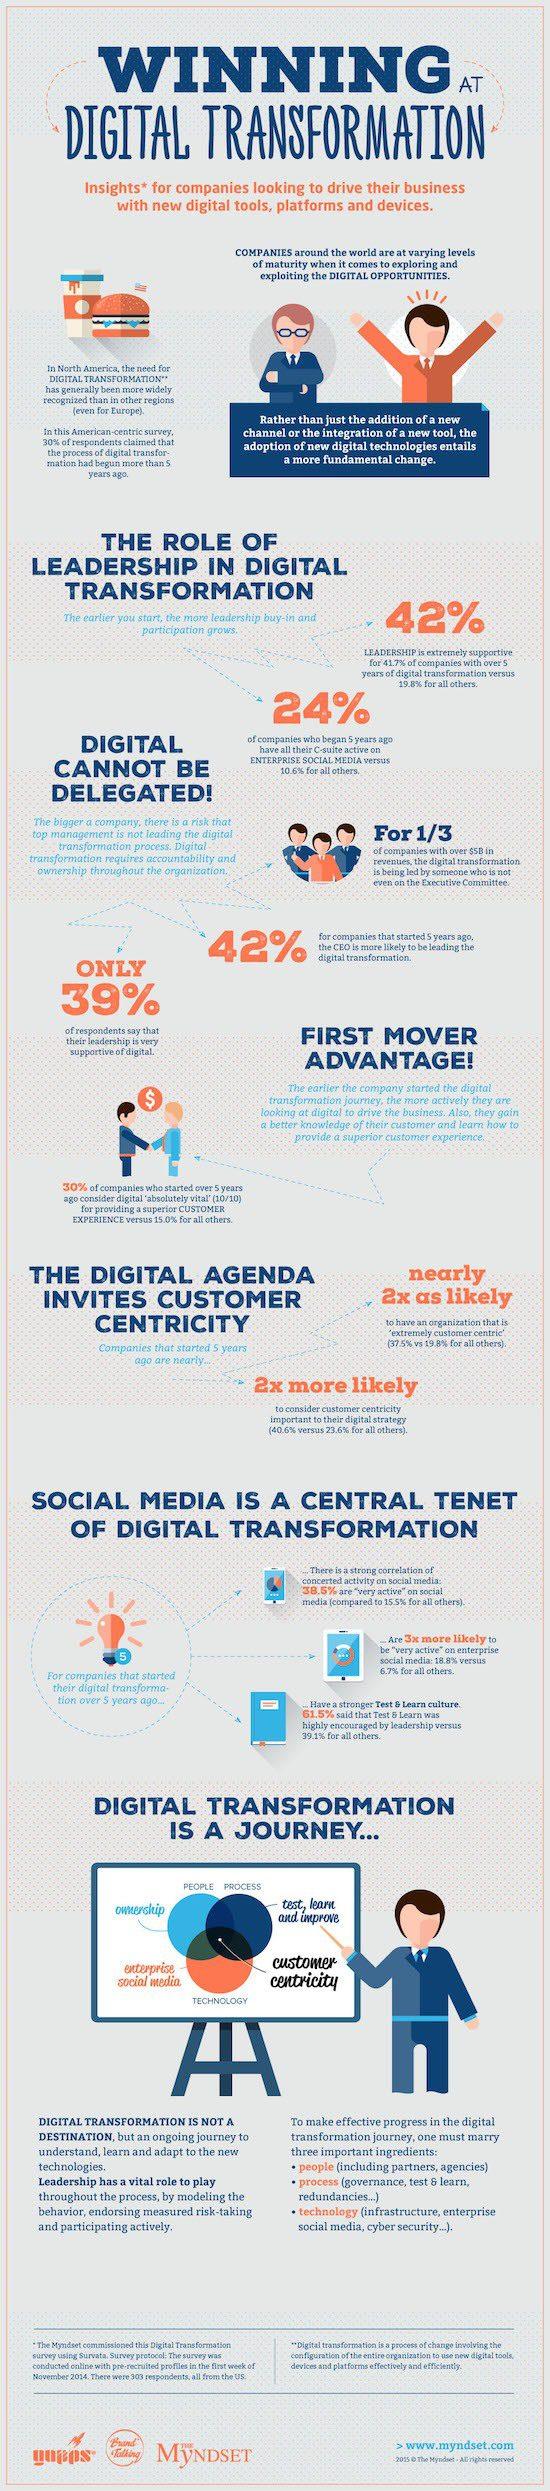 Infographic Winning Digital Transformation - Myndset